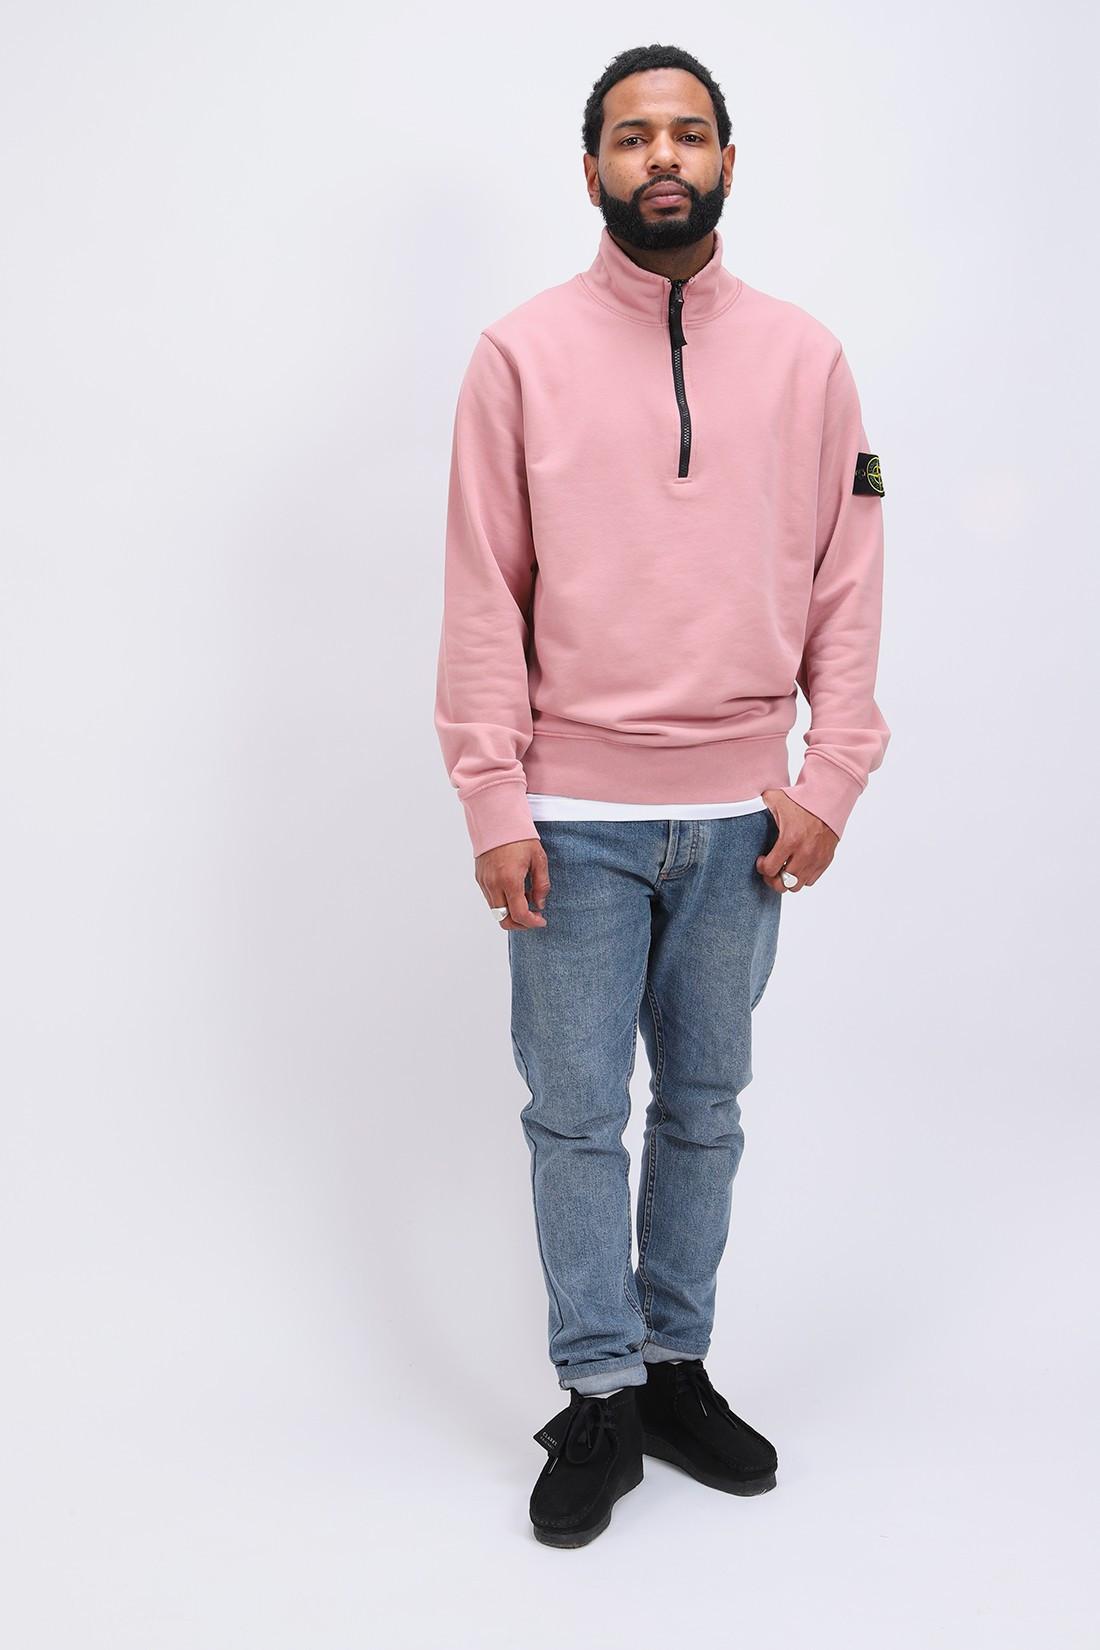 STONE ISLAND / 61951 half zip sweater v0086 Rosa quarzo